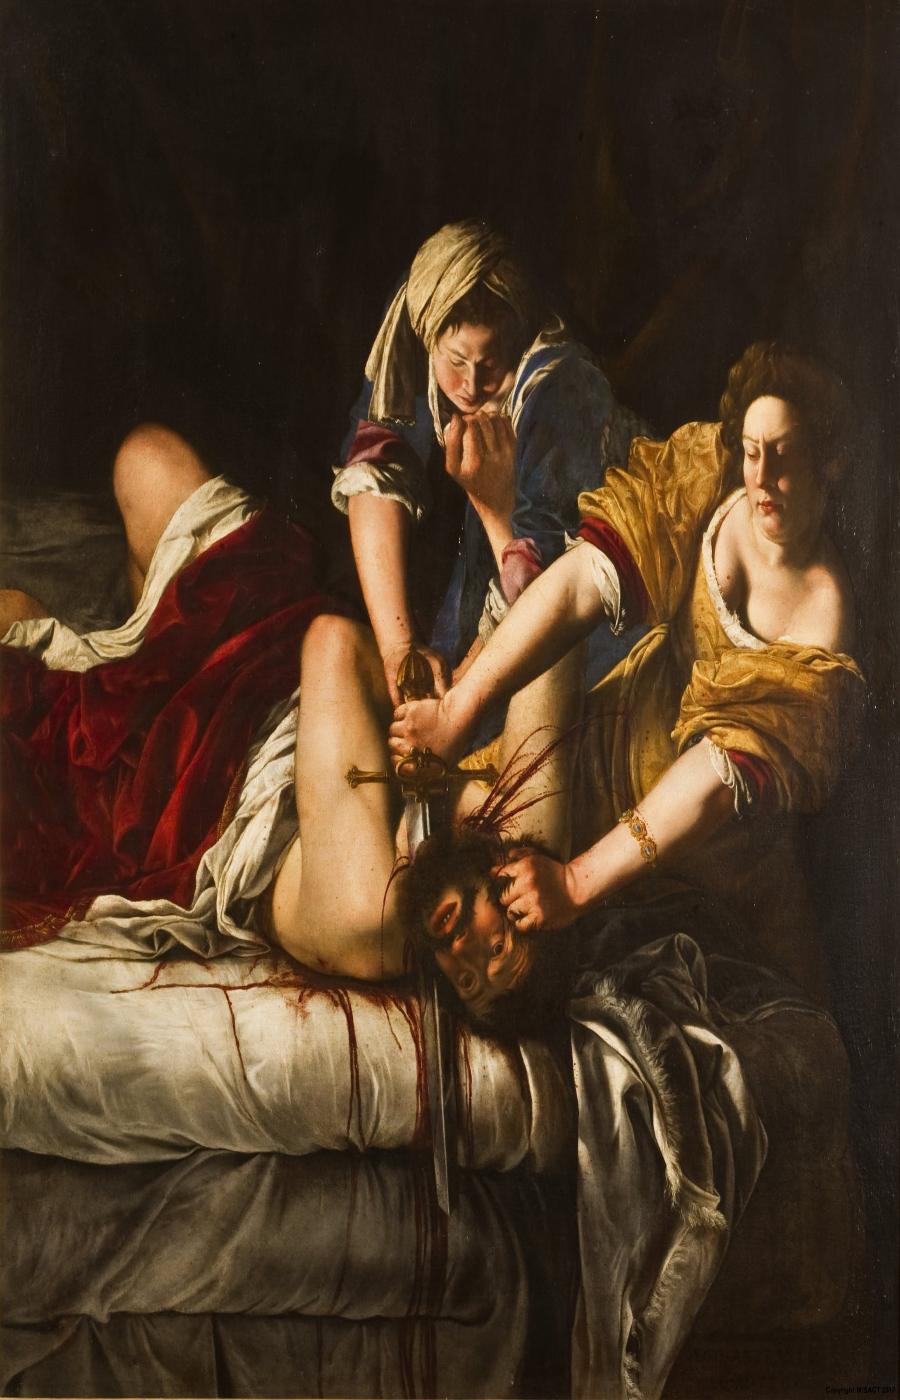 Artemisia Gentileschi. Judith decapitando a Holofernes